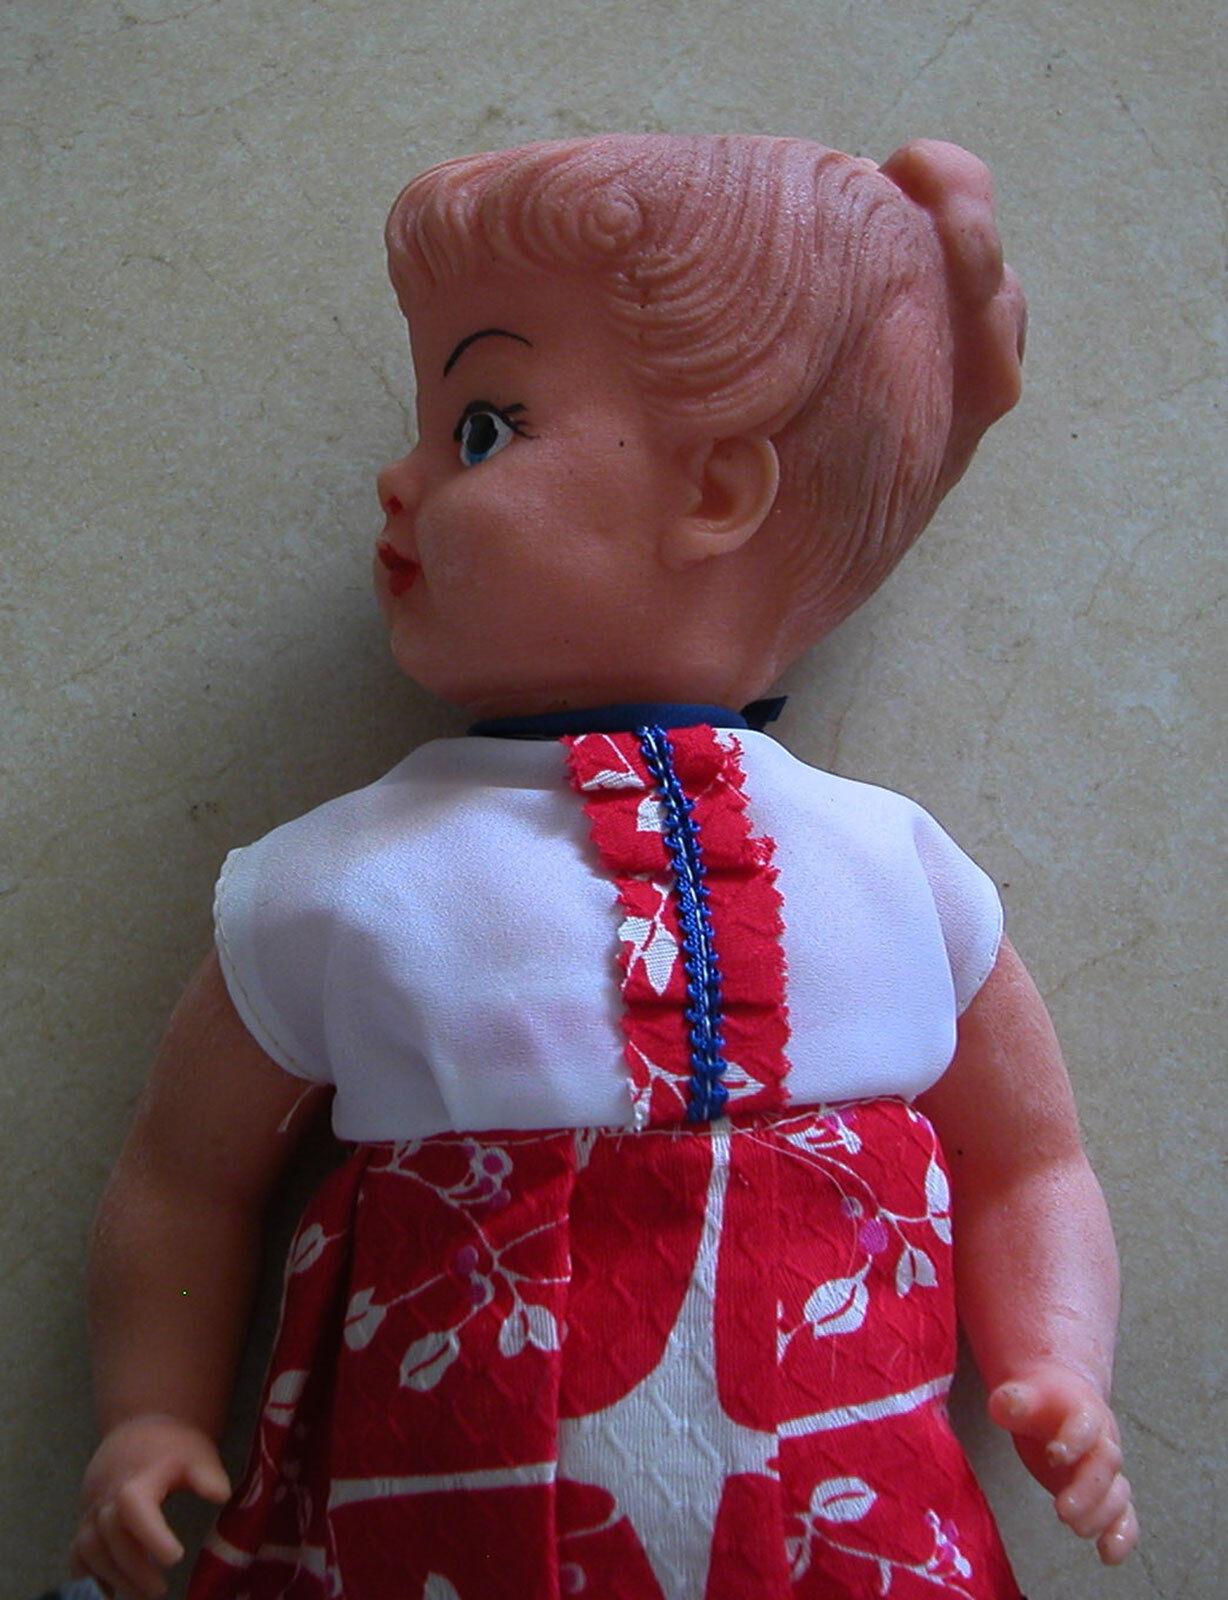 A Rare Vintage Big Doll By Bubati Toys Israeli Company 43.5 cm (17.4 ) Long -New